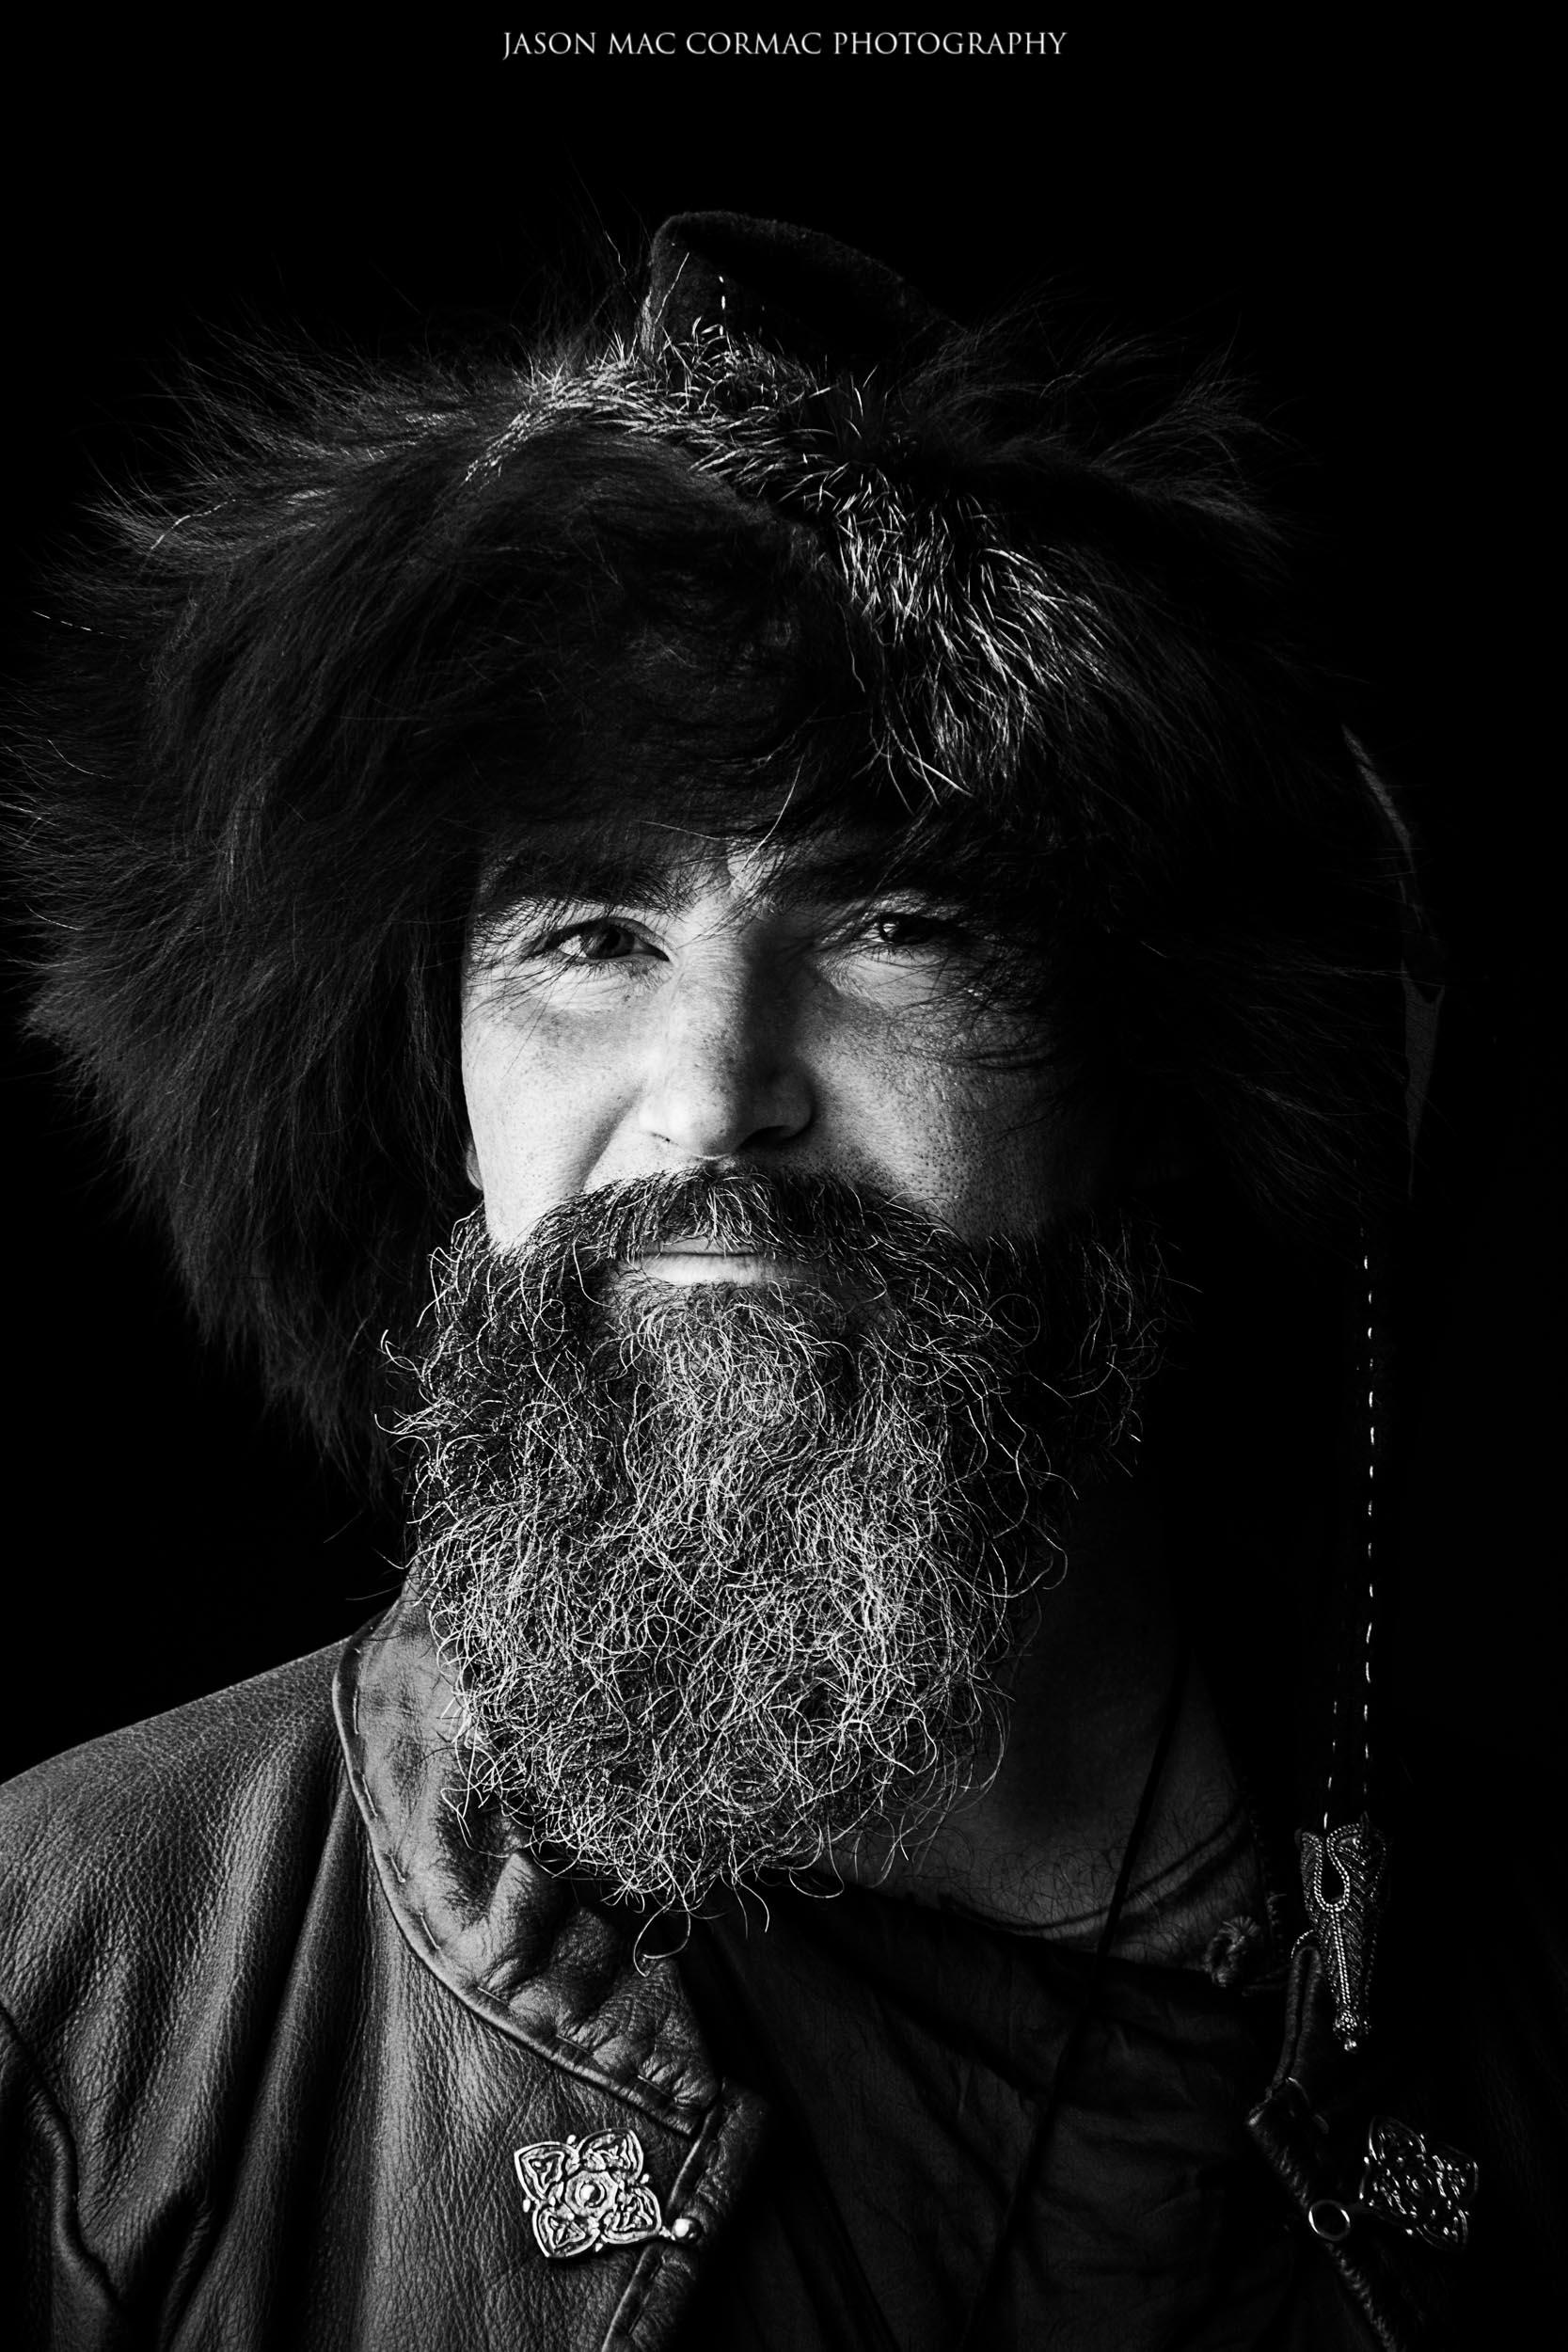 IMG_8530 - Dublin Photographer Jason Mac Cormac-Edit.jpg